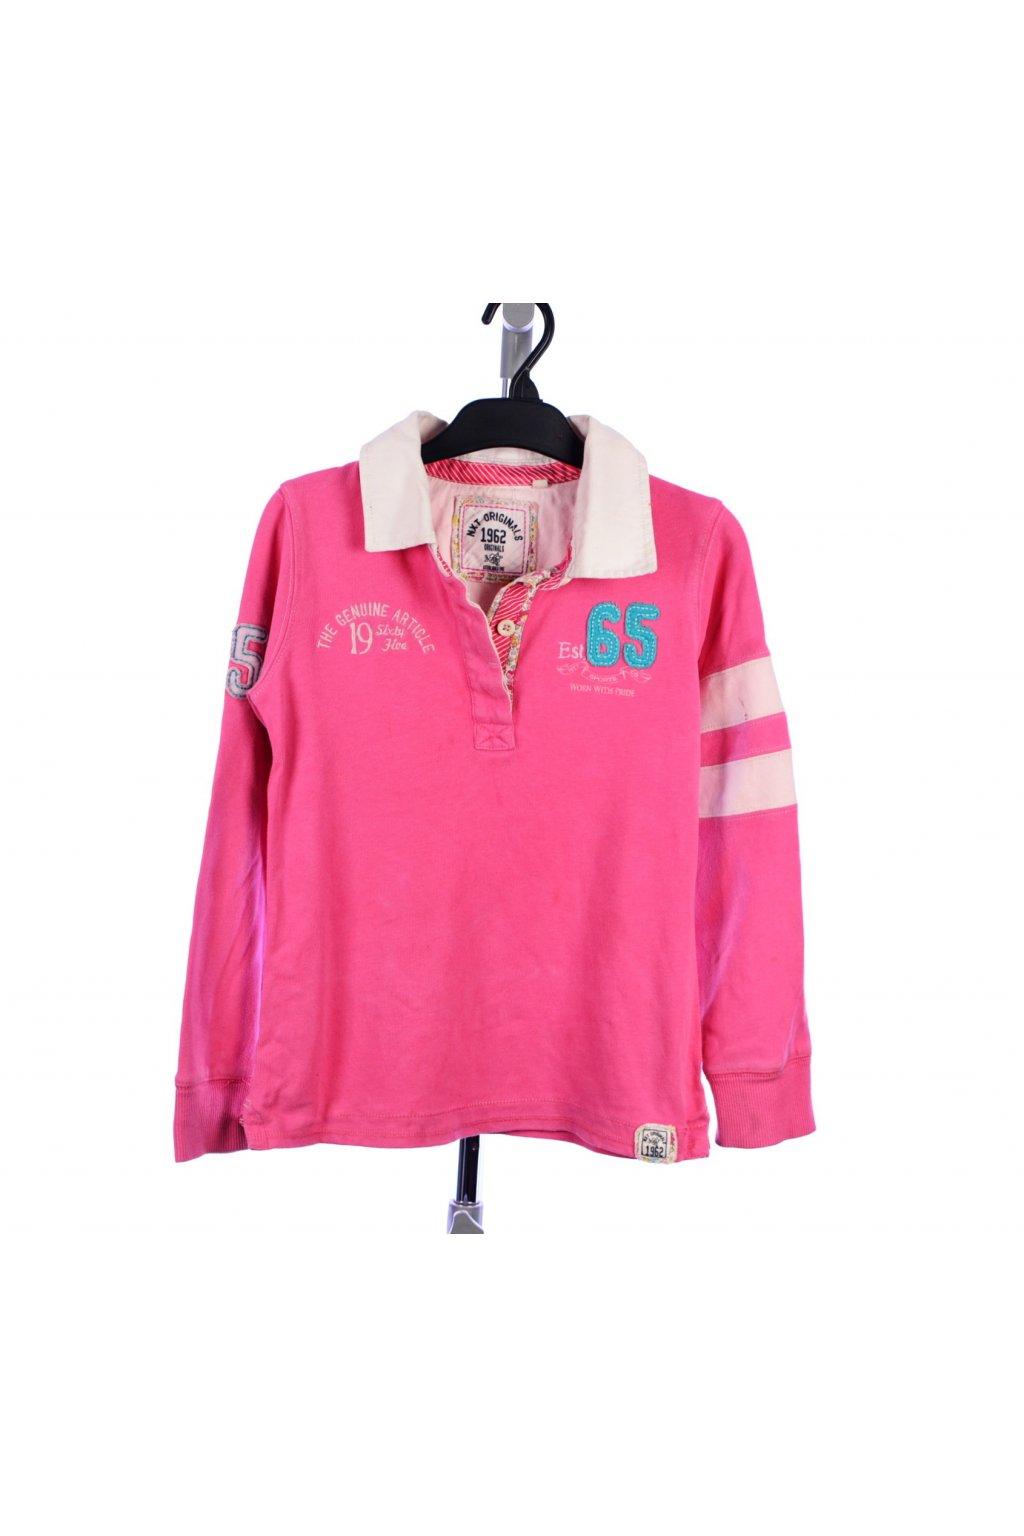 tričko Next vel.134